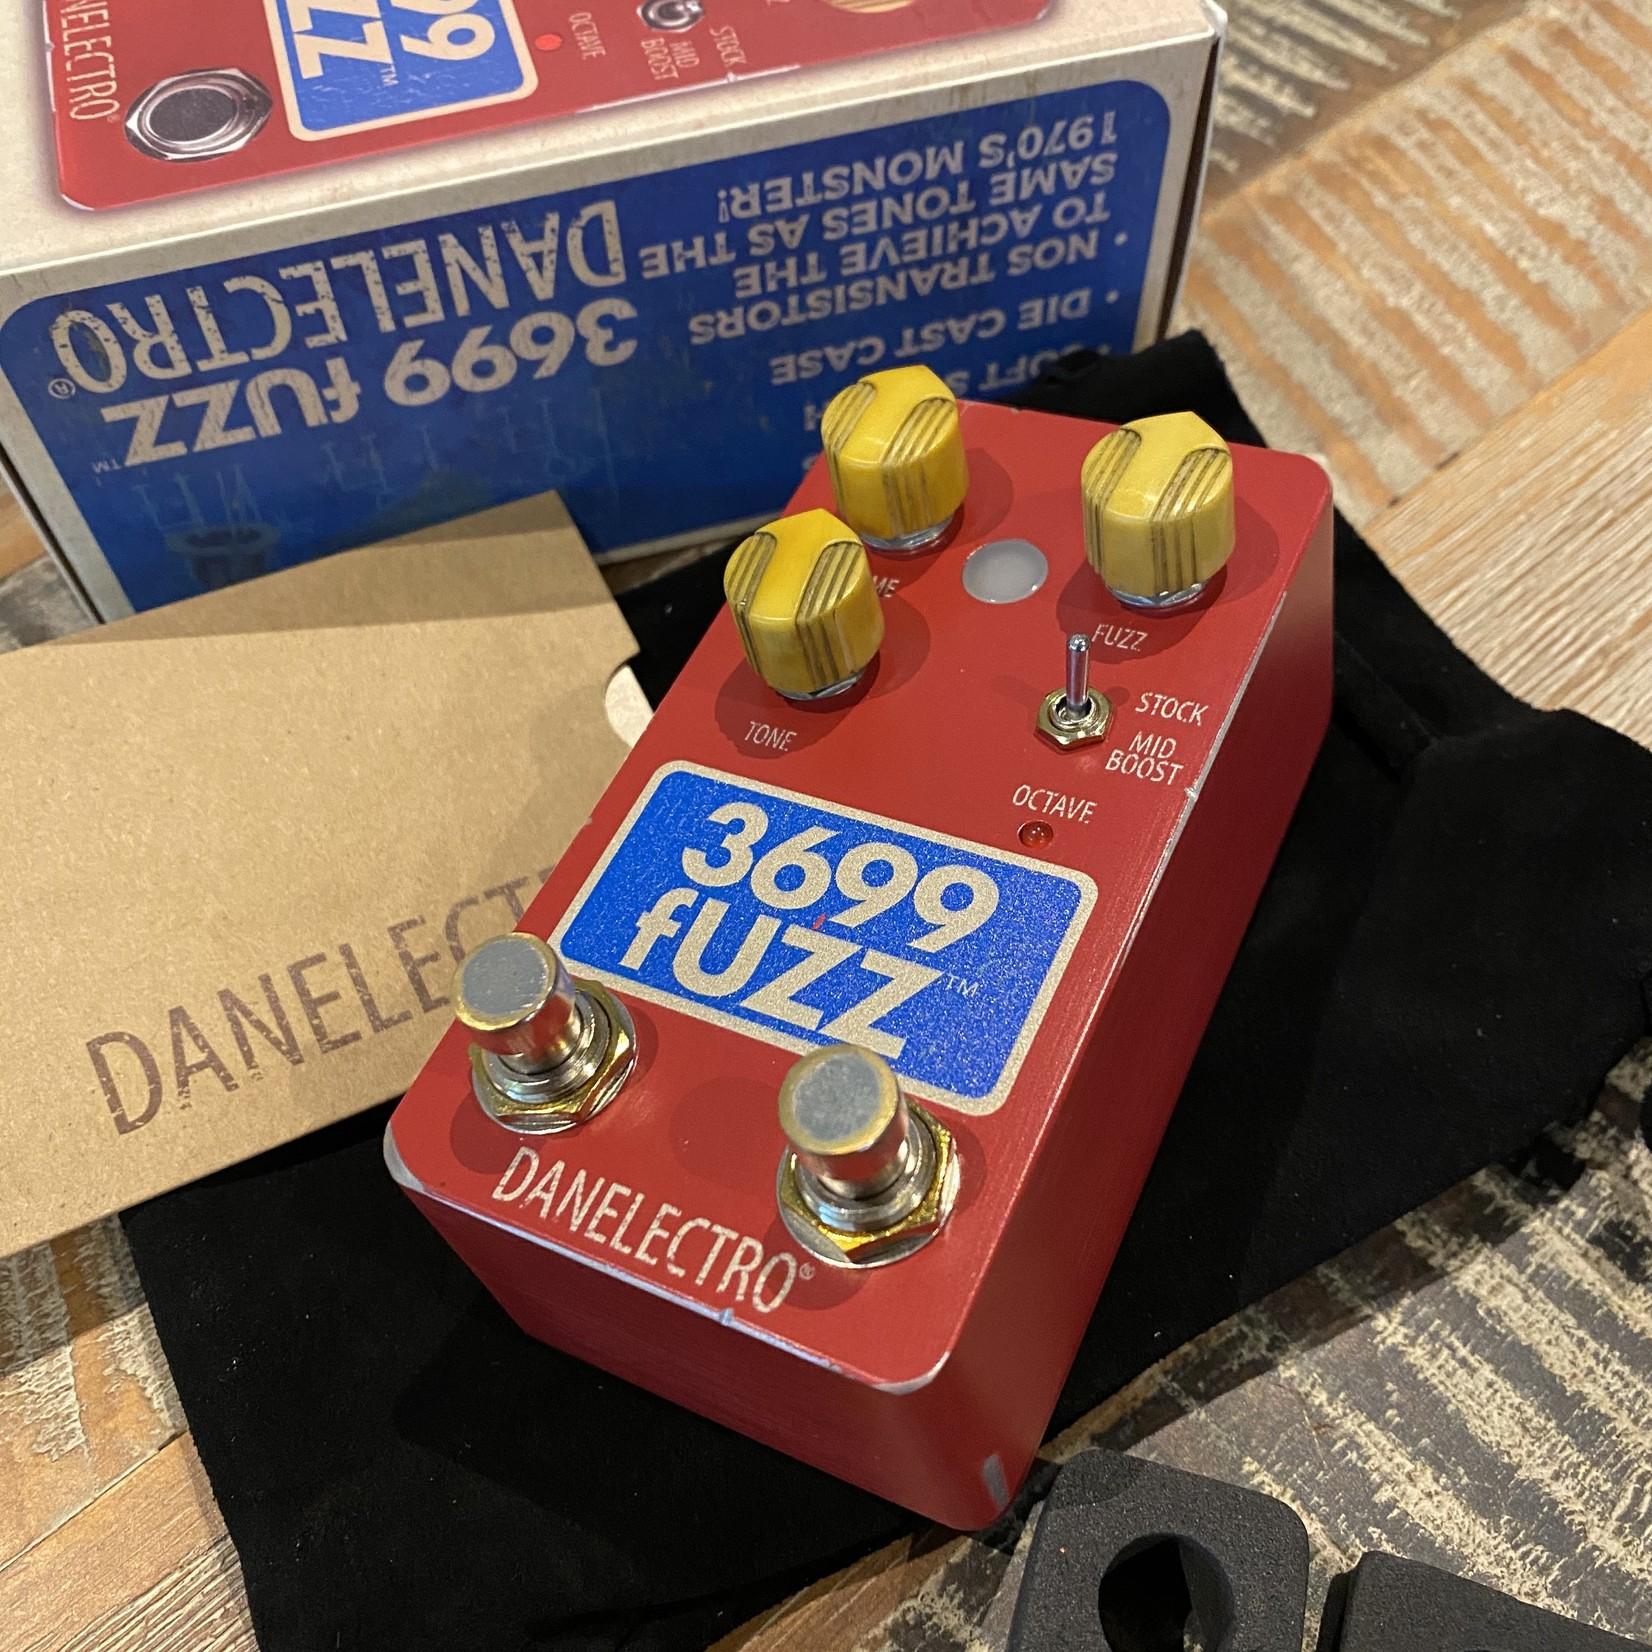 Danelectro Danelectro 3699 fUZZ - 2020 Reissue of the classic fOXX Tone Machine!